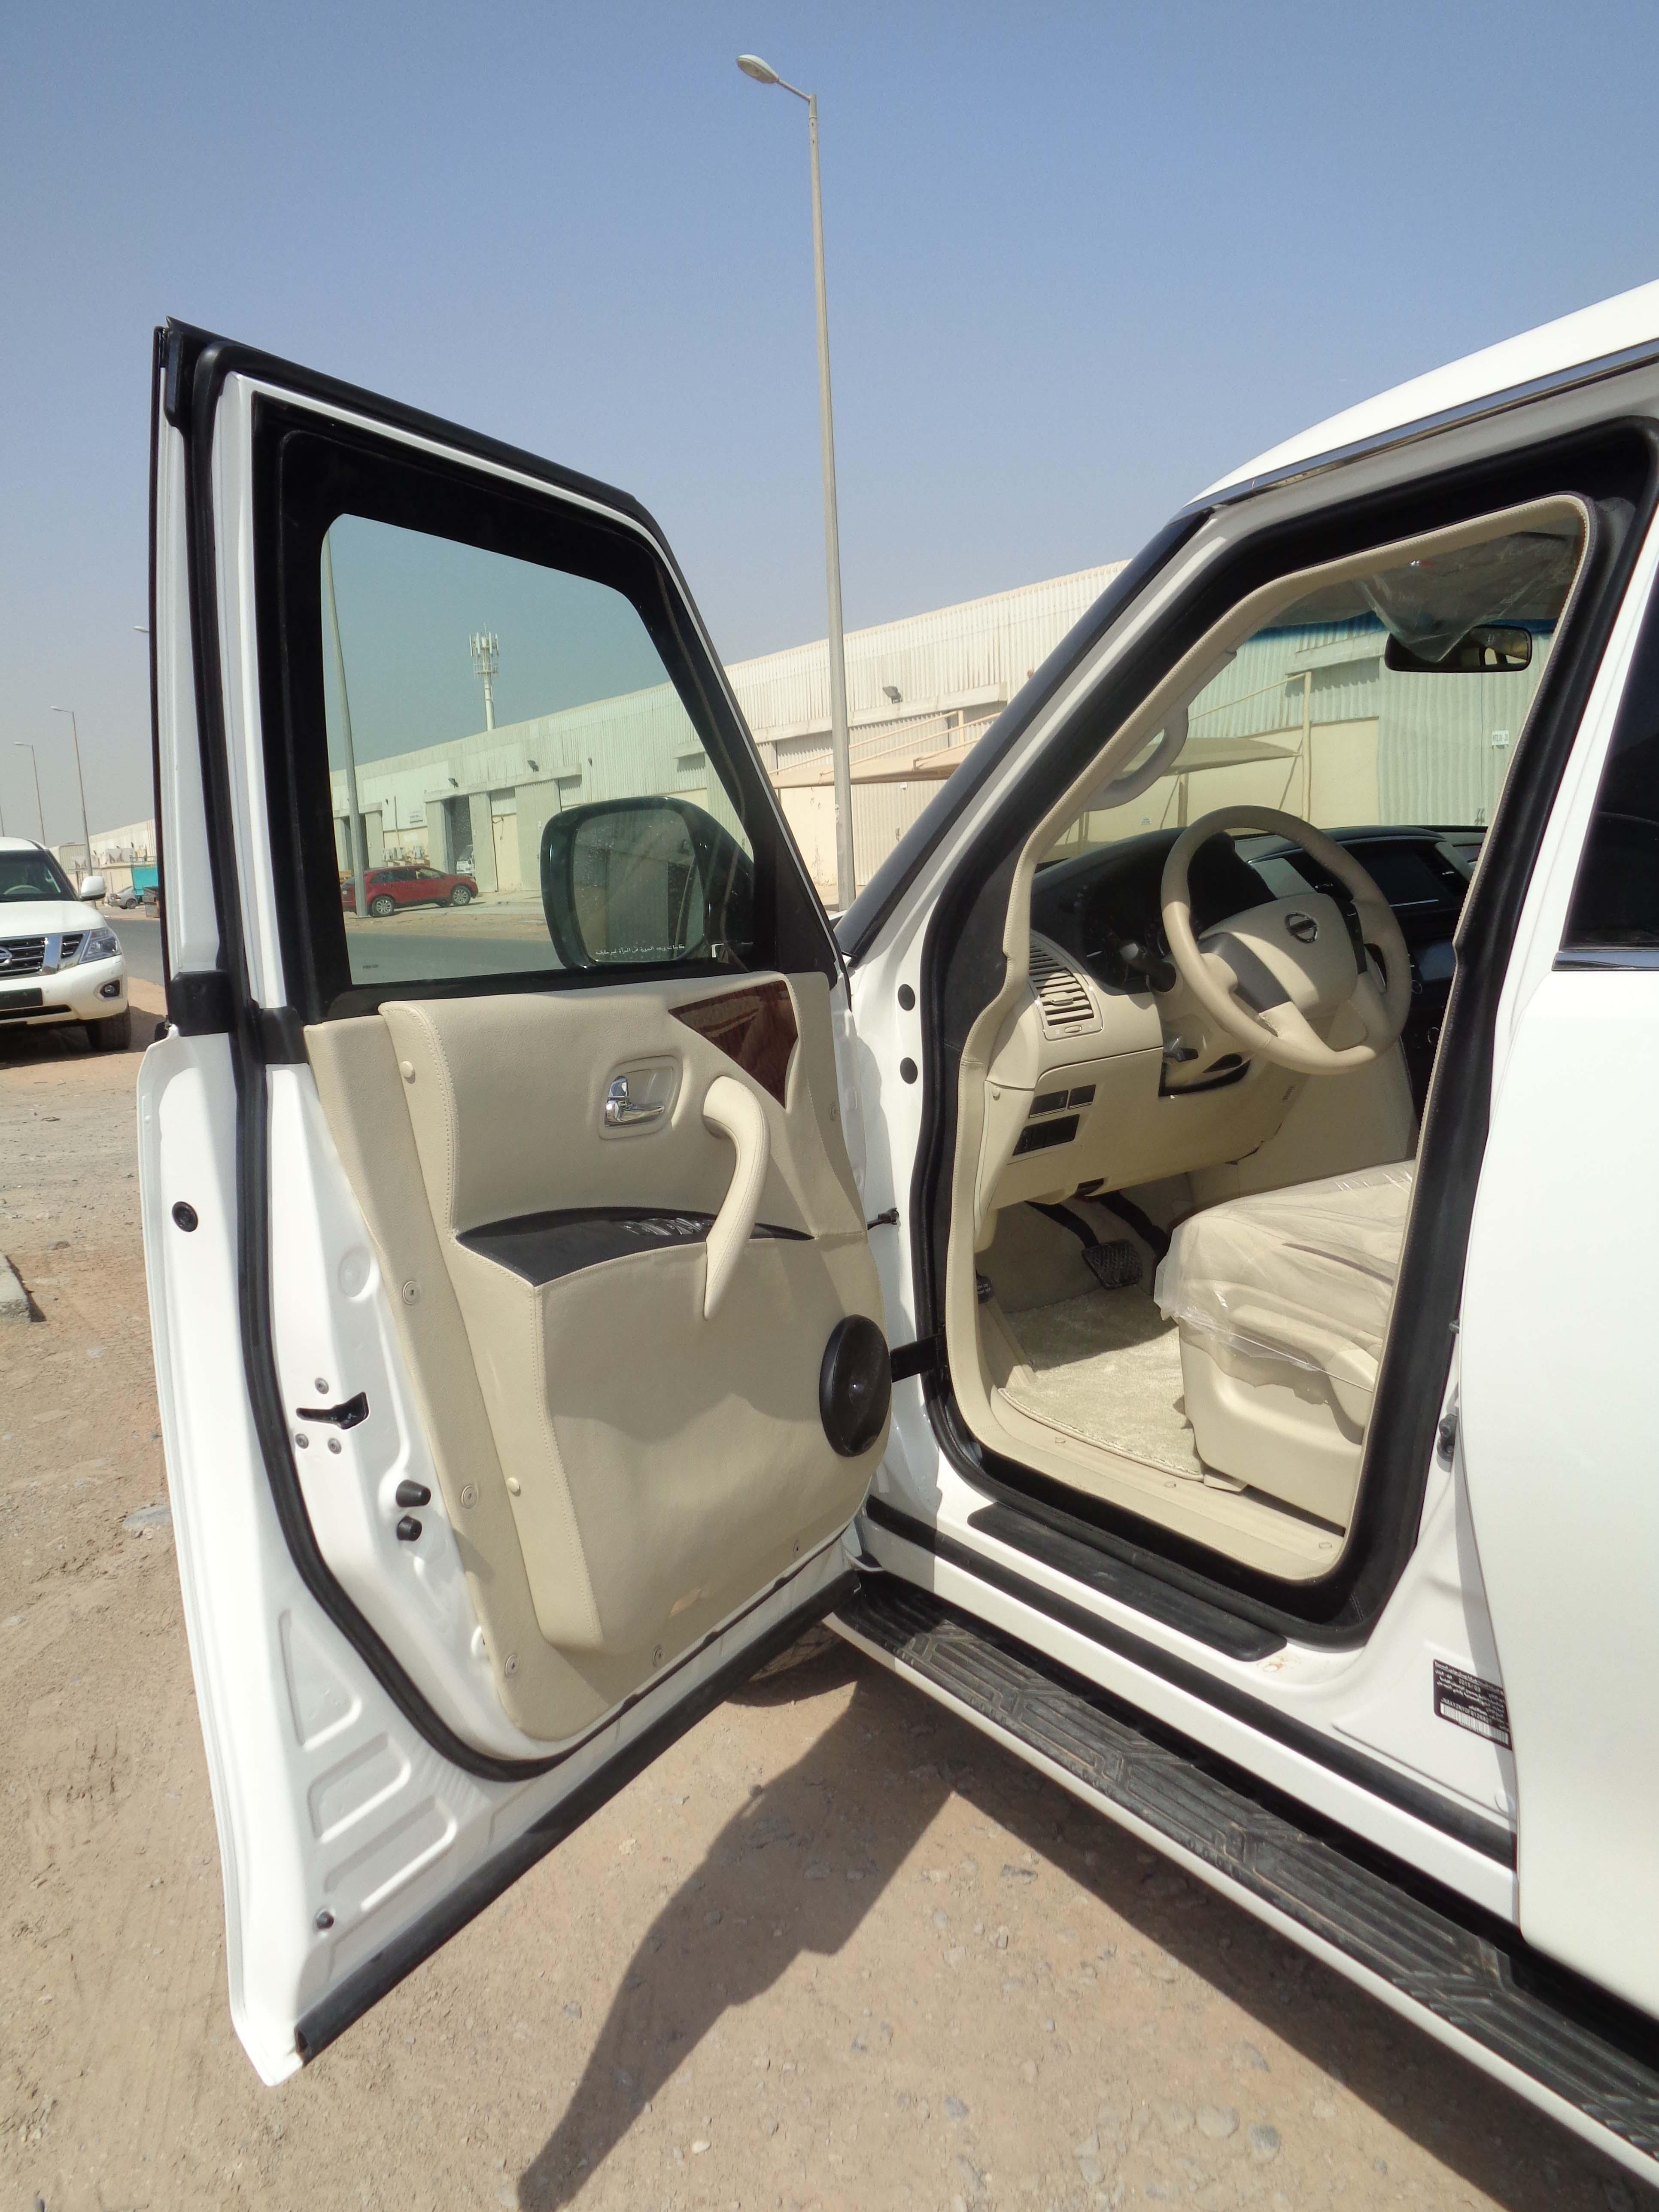 Nissan Patrol from Mahindra Emirates Vehicle Armouring